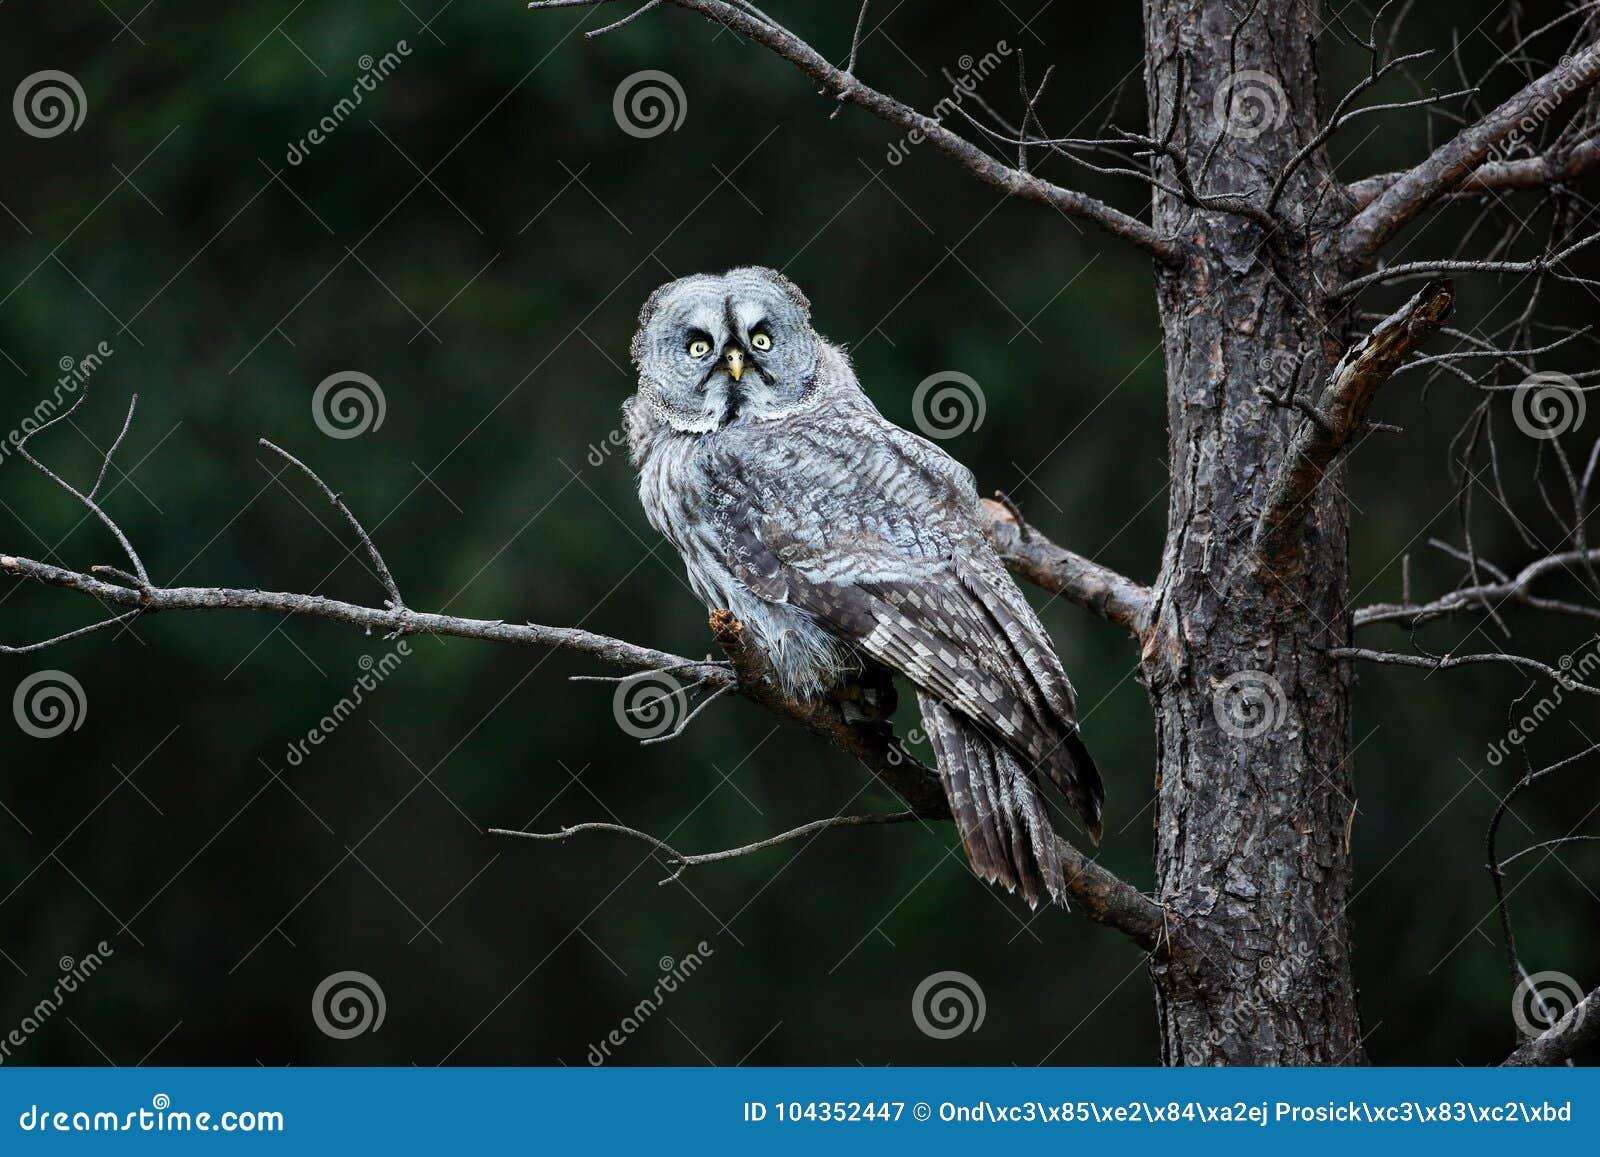 Owl in dark forest, Sweden. Great grey owl, Strix nebulosa, sitting on broken down tree stump with green forest in background. Wil